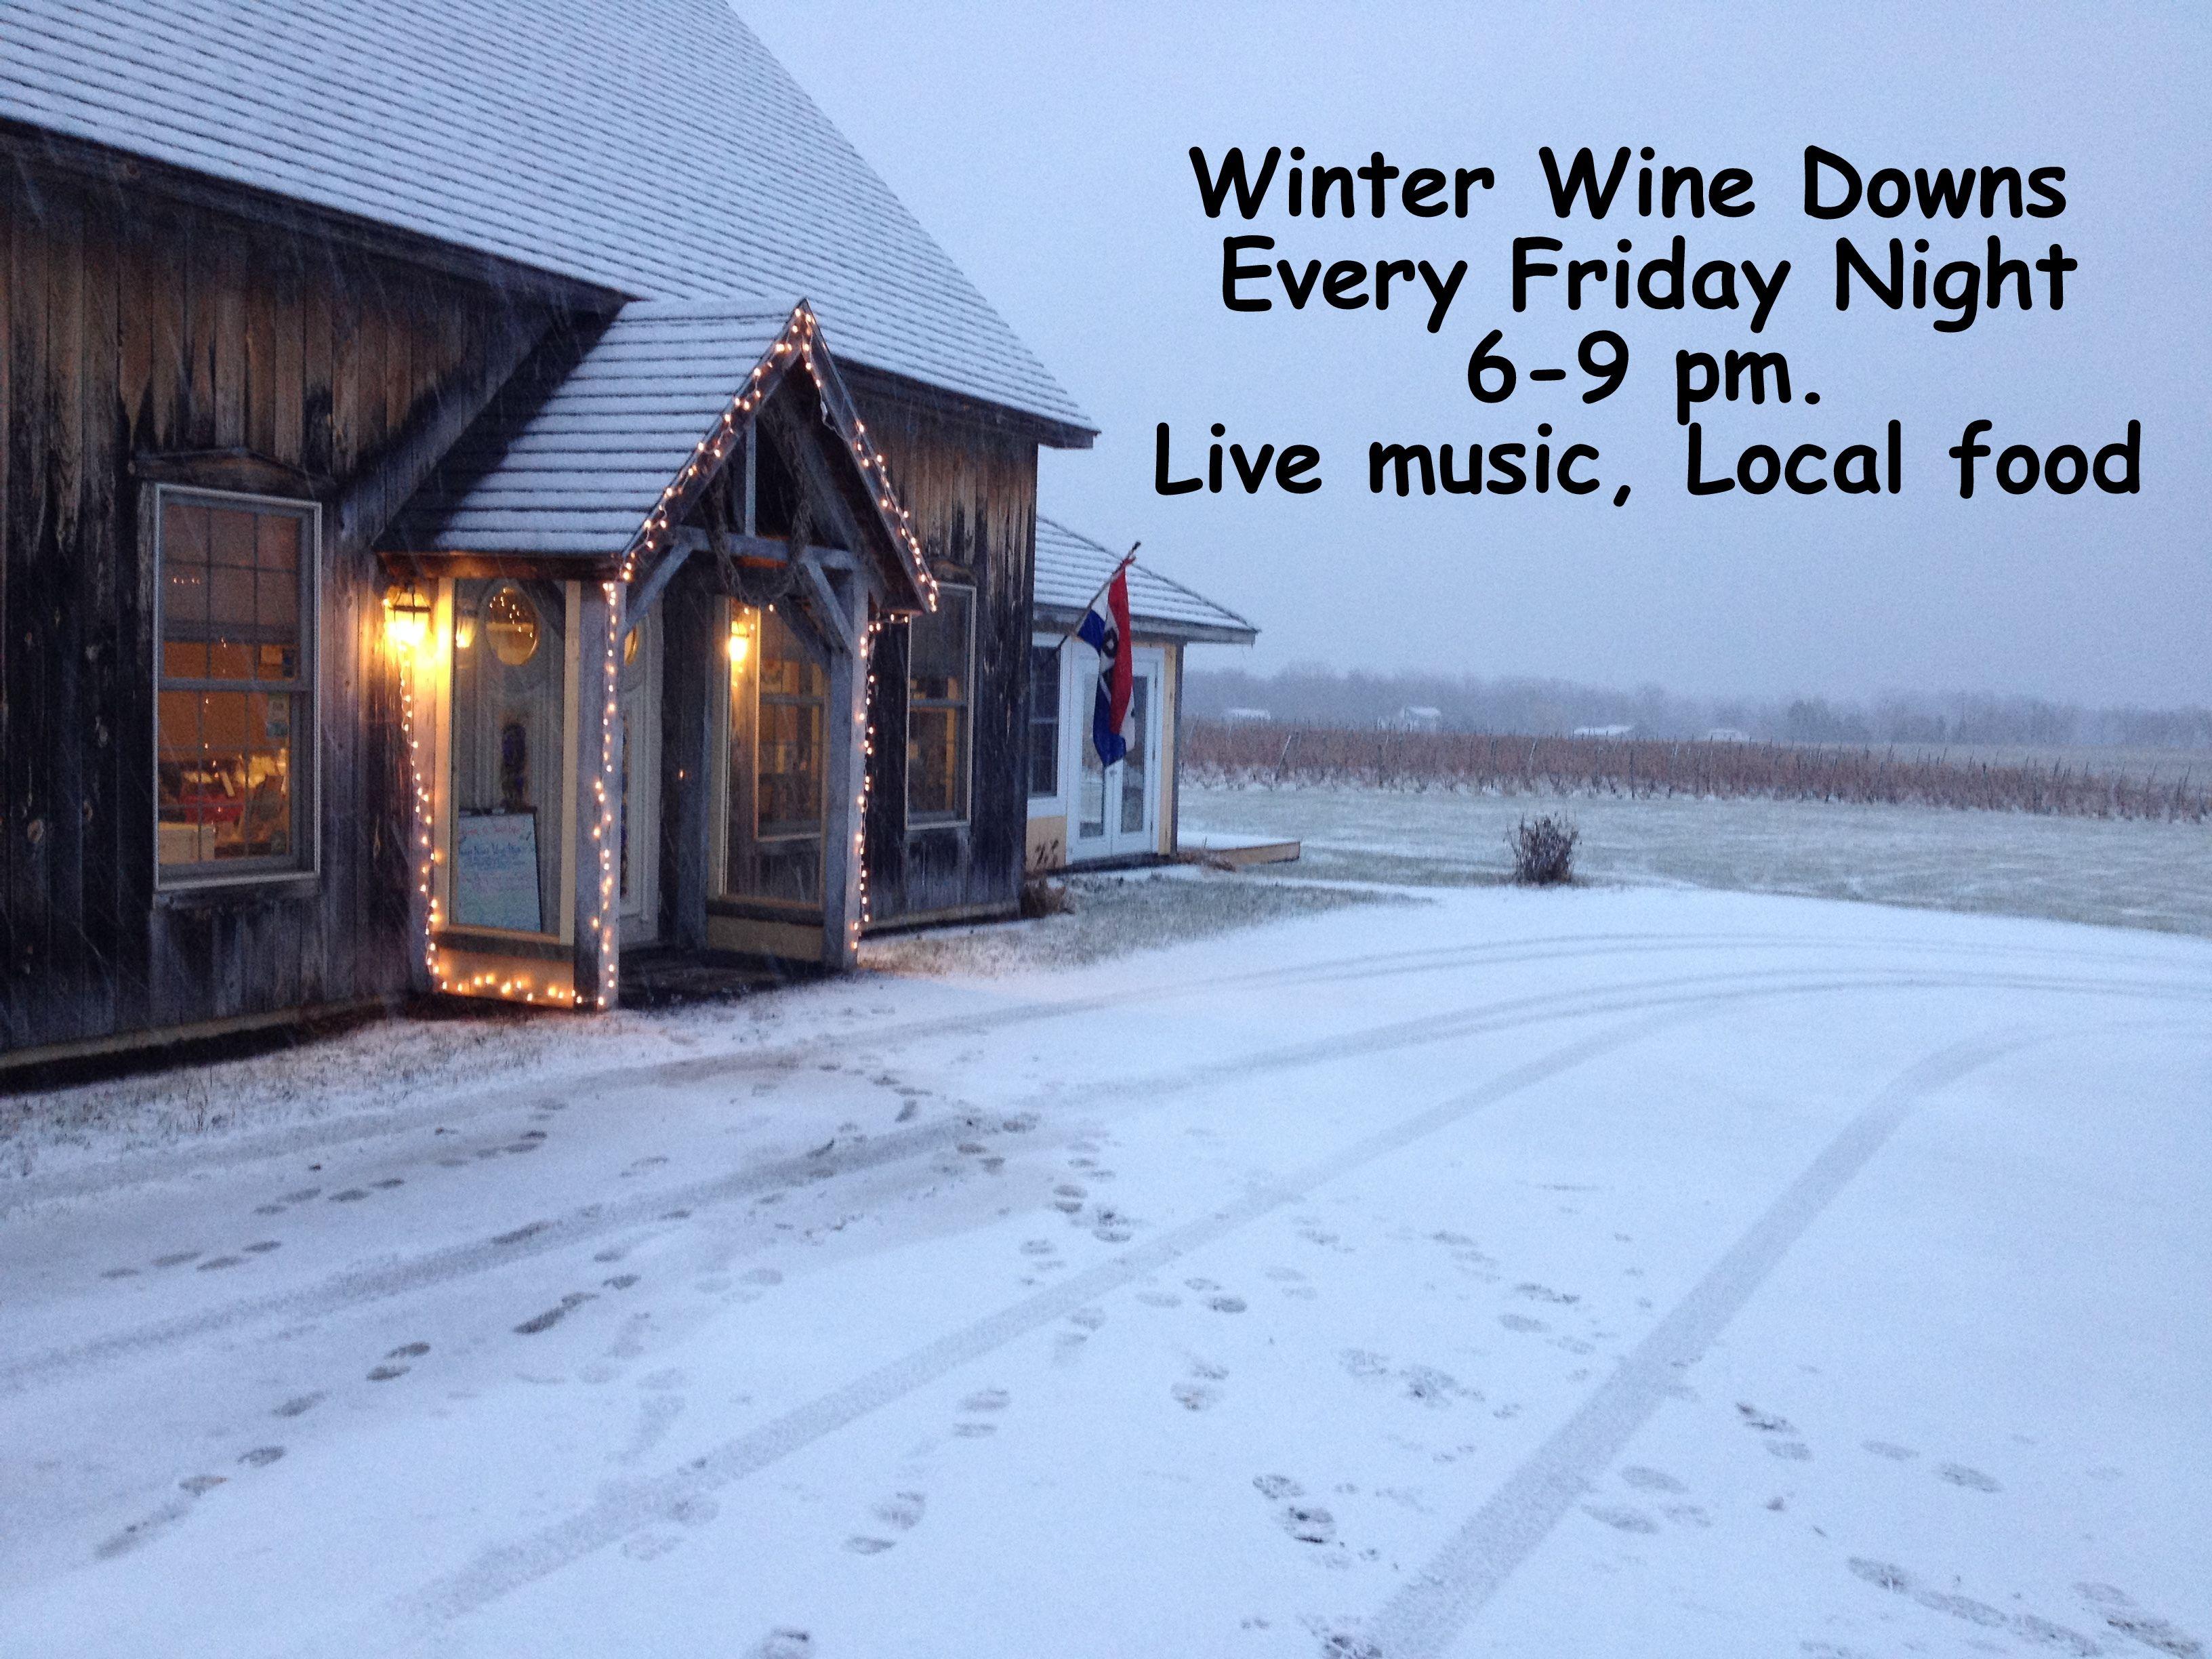 Snow Farm Vineyard Vermont's First Vineyard and Grape